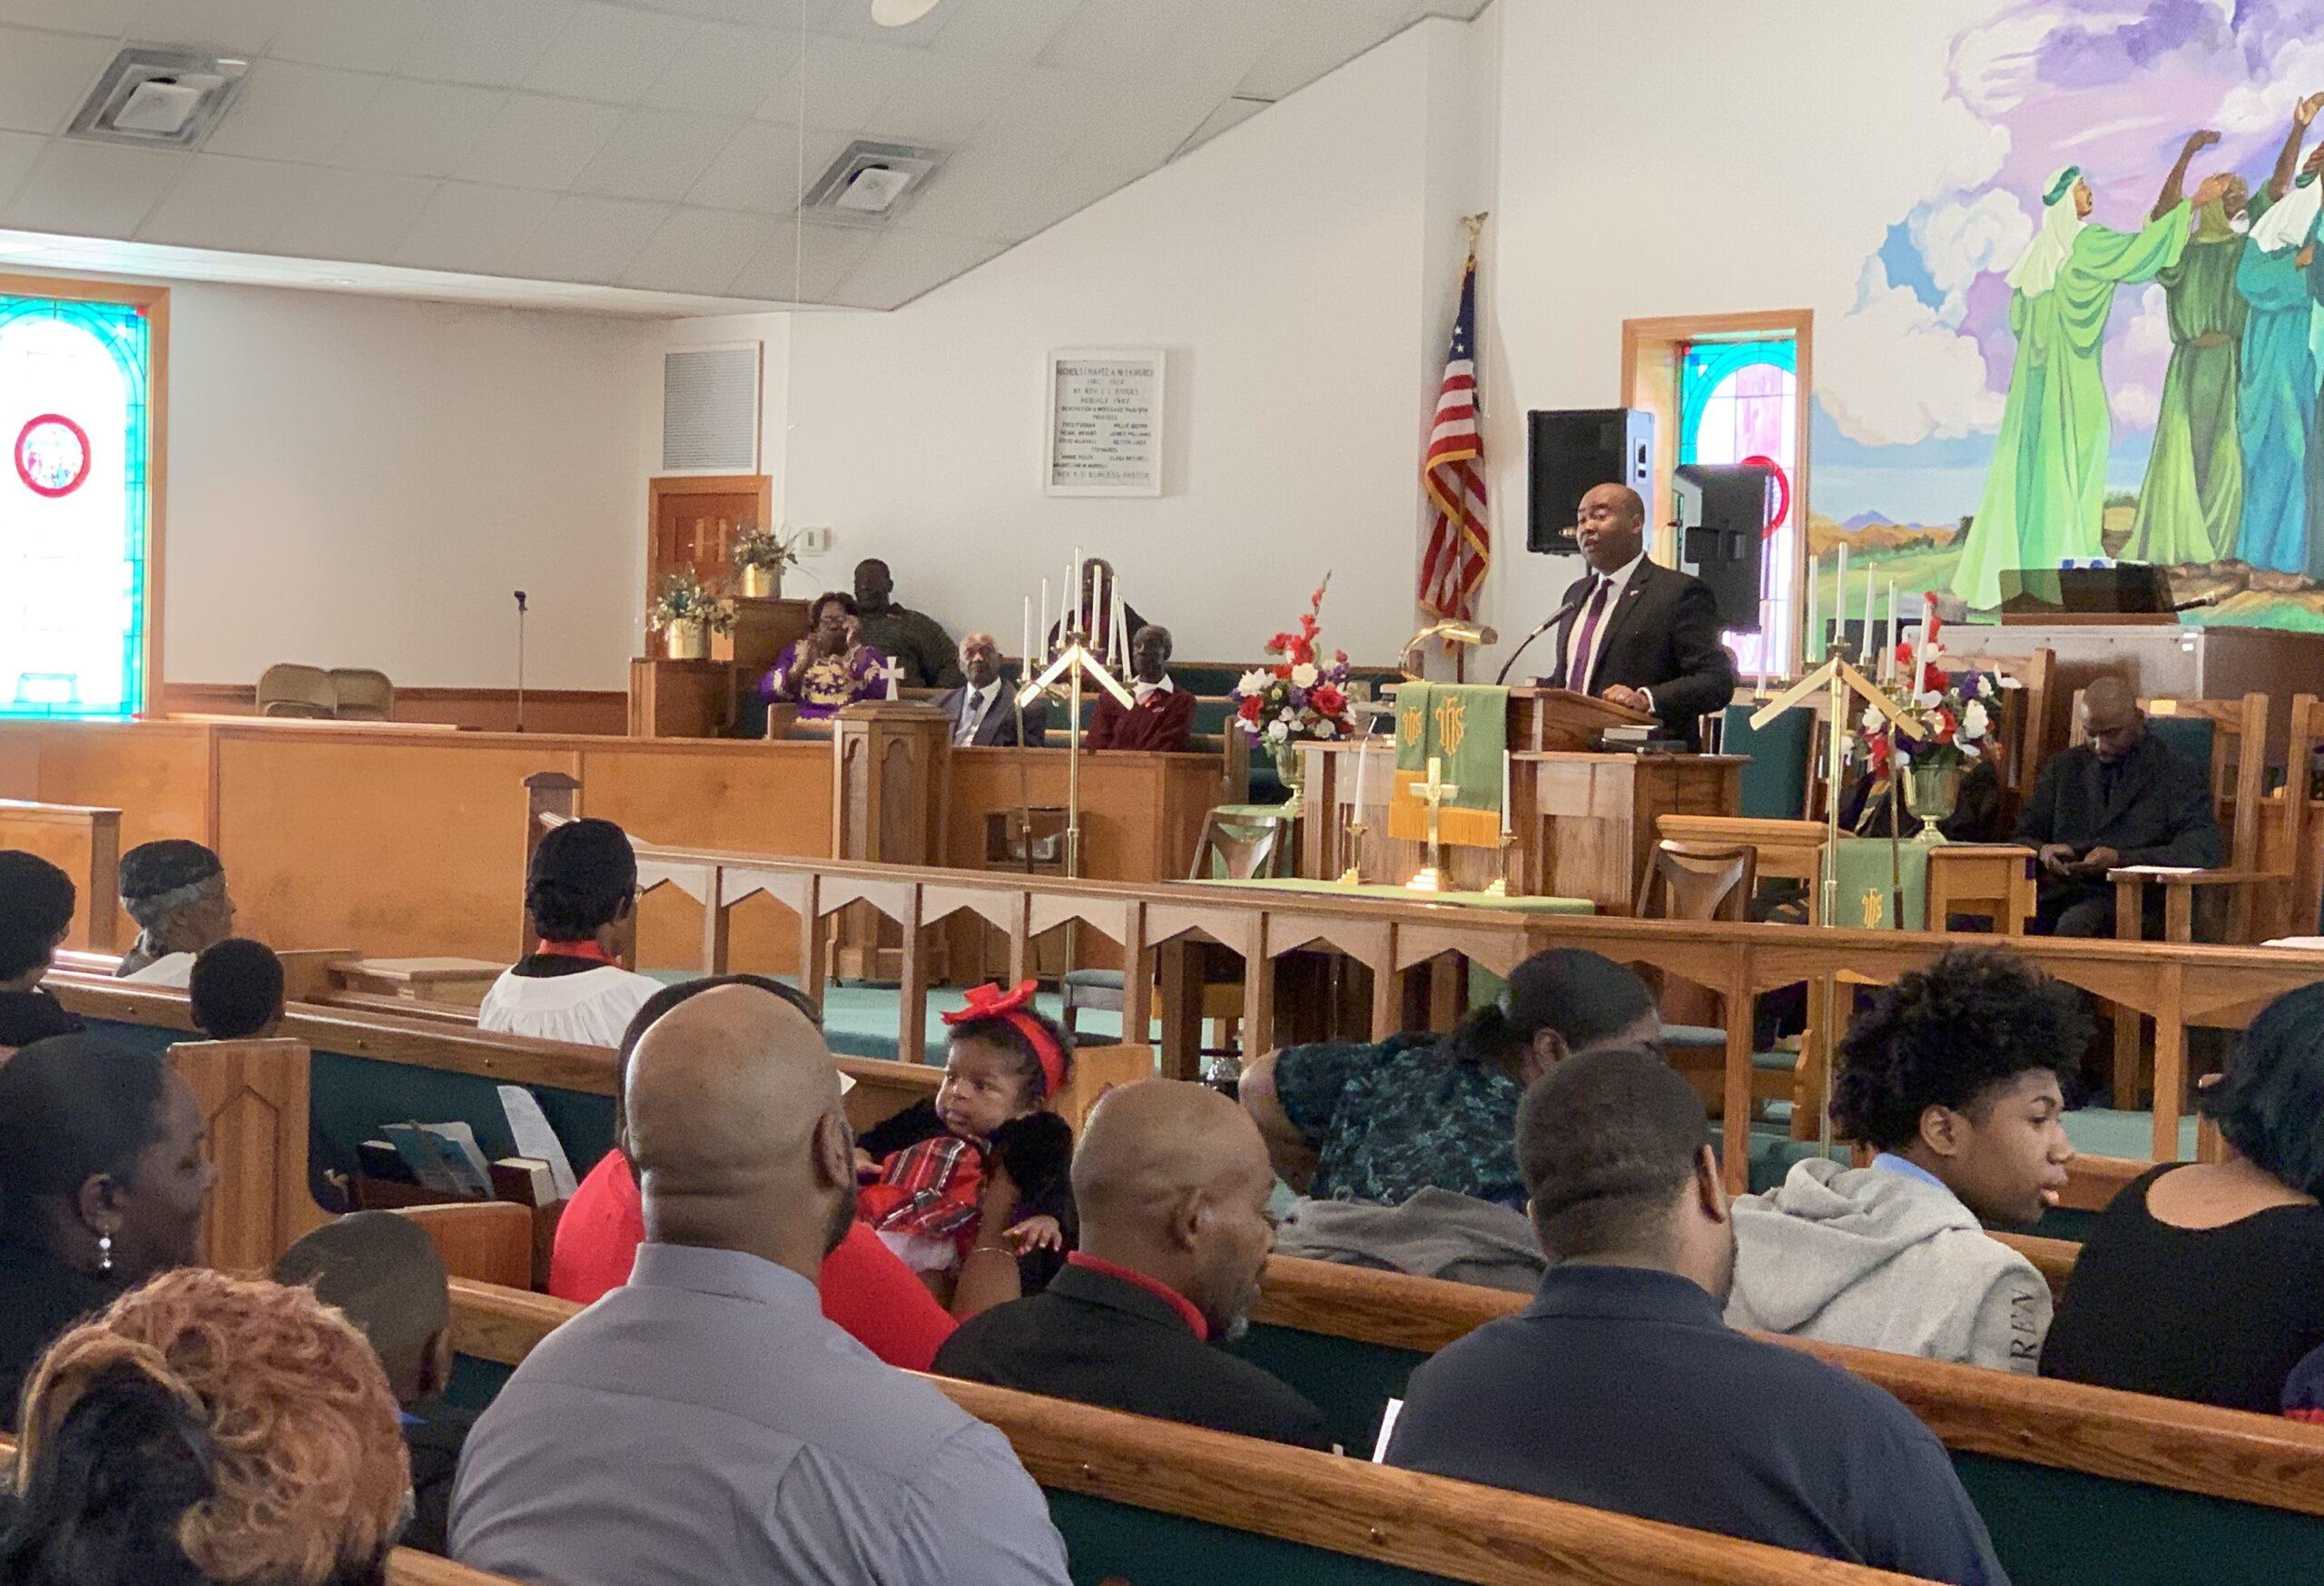 Jaime Harrison speaks at Nichols Chapel AME church in Charleston, South Carolina on February 23, 2020. RNS photo by Jack Jenkins,